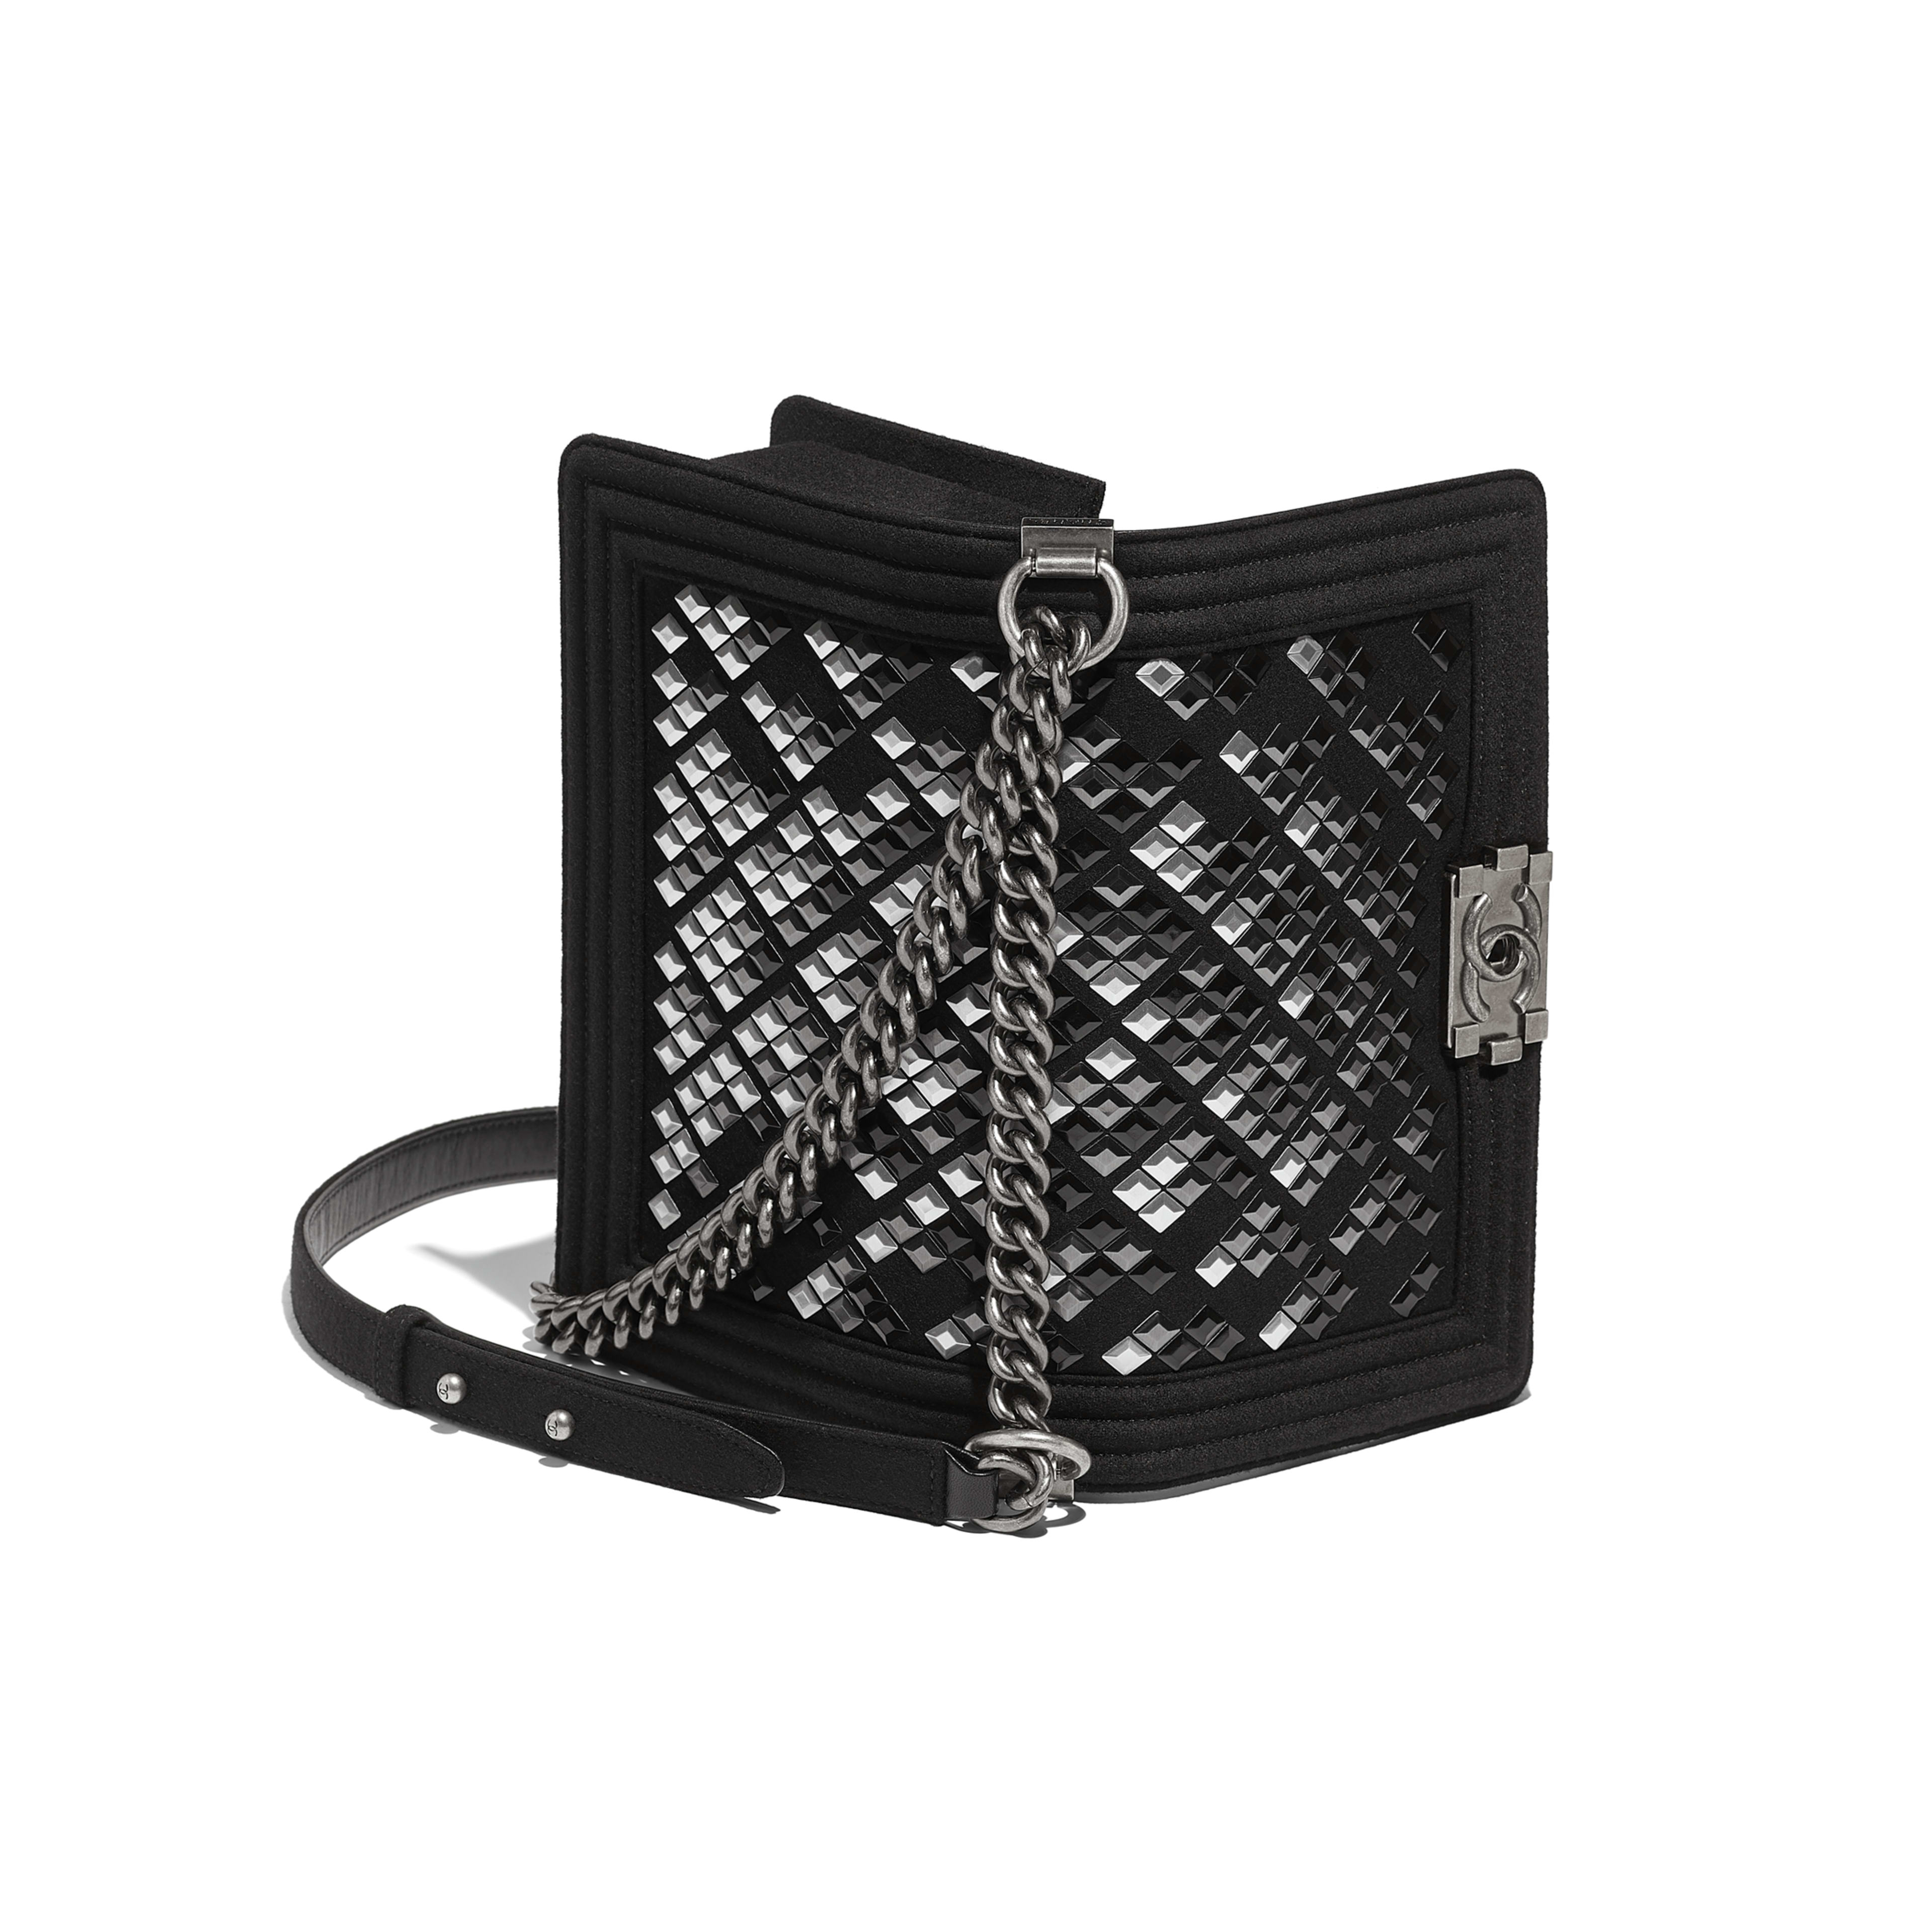 BOY CHANEL Handbag Embroidered Wool, Lambskin & Ruthenium-Finish Metal Black -                                            view 3 - see full sized version